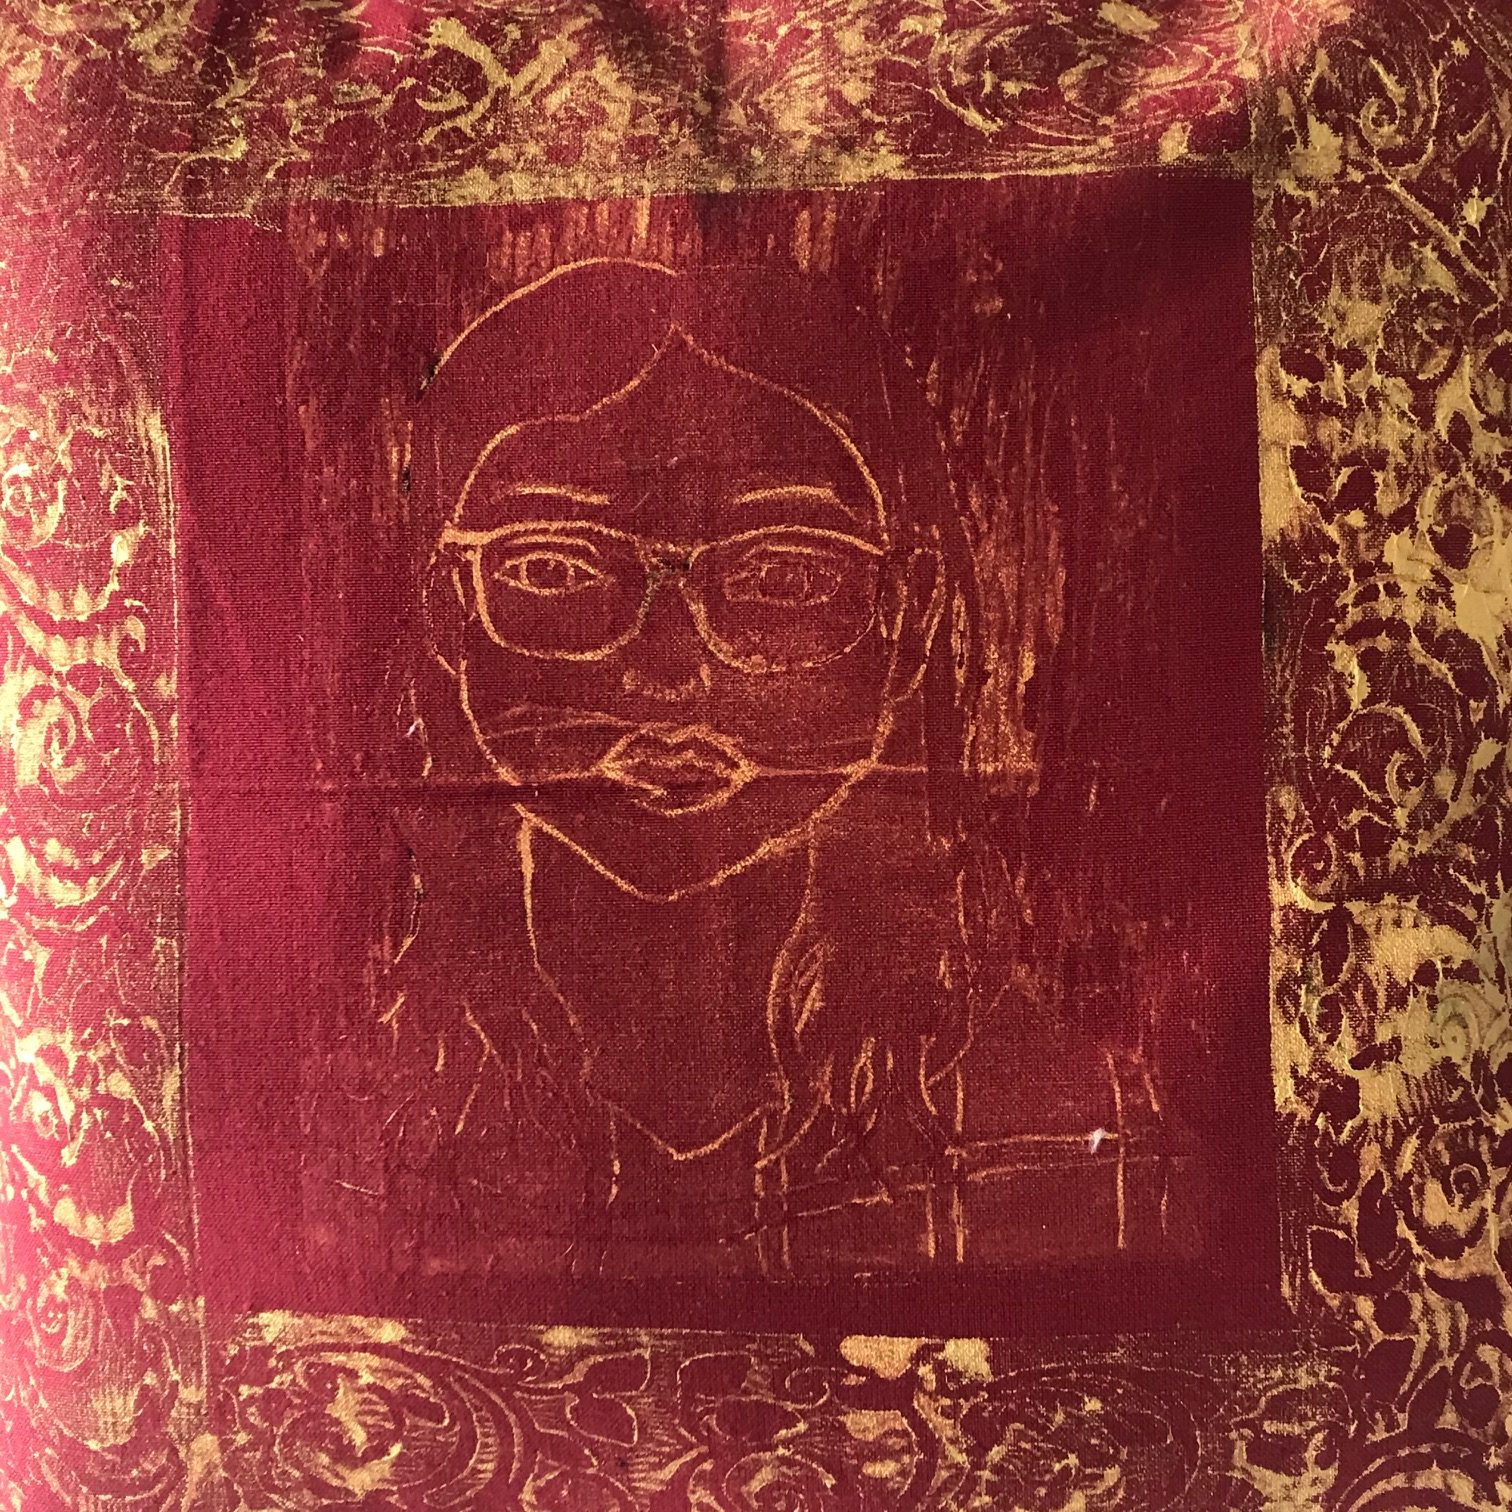 Portrait in Gold